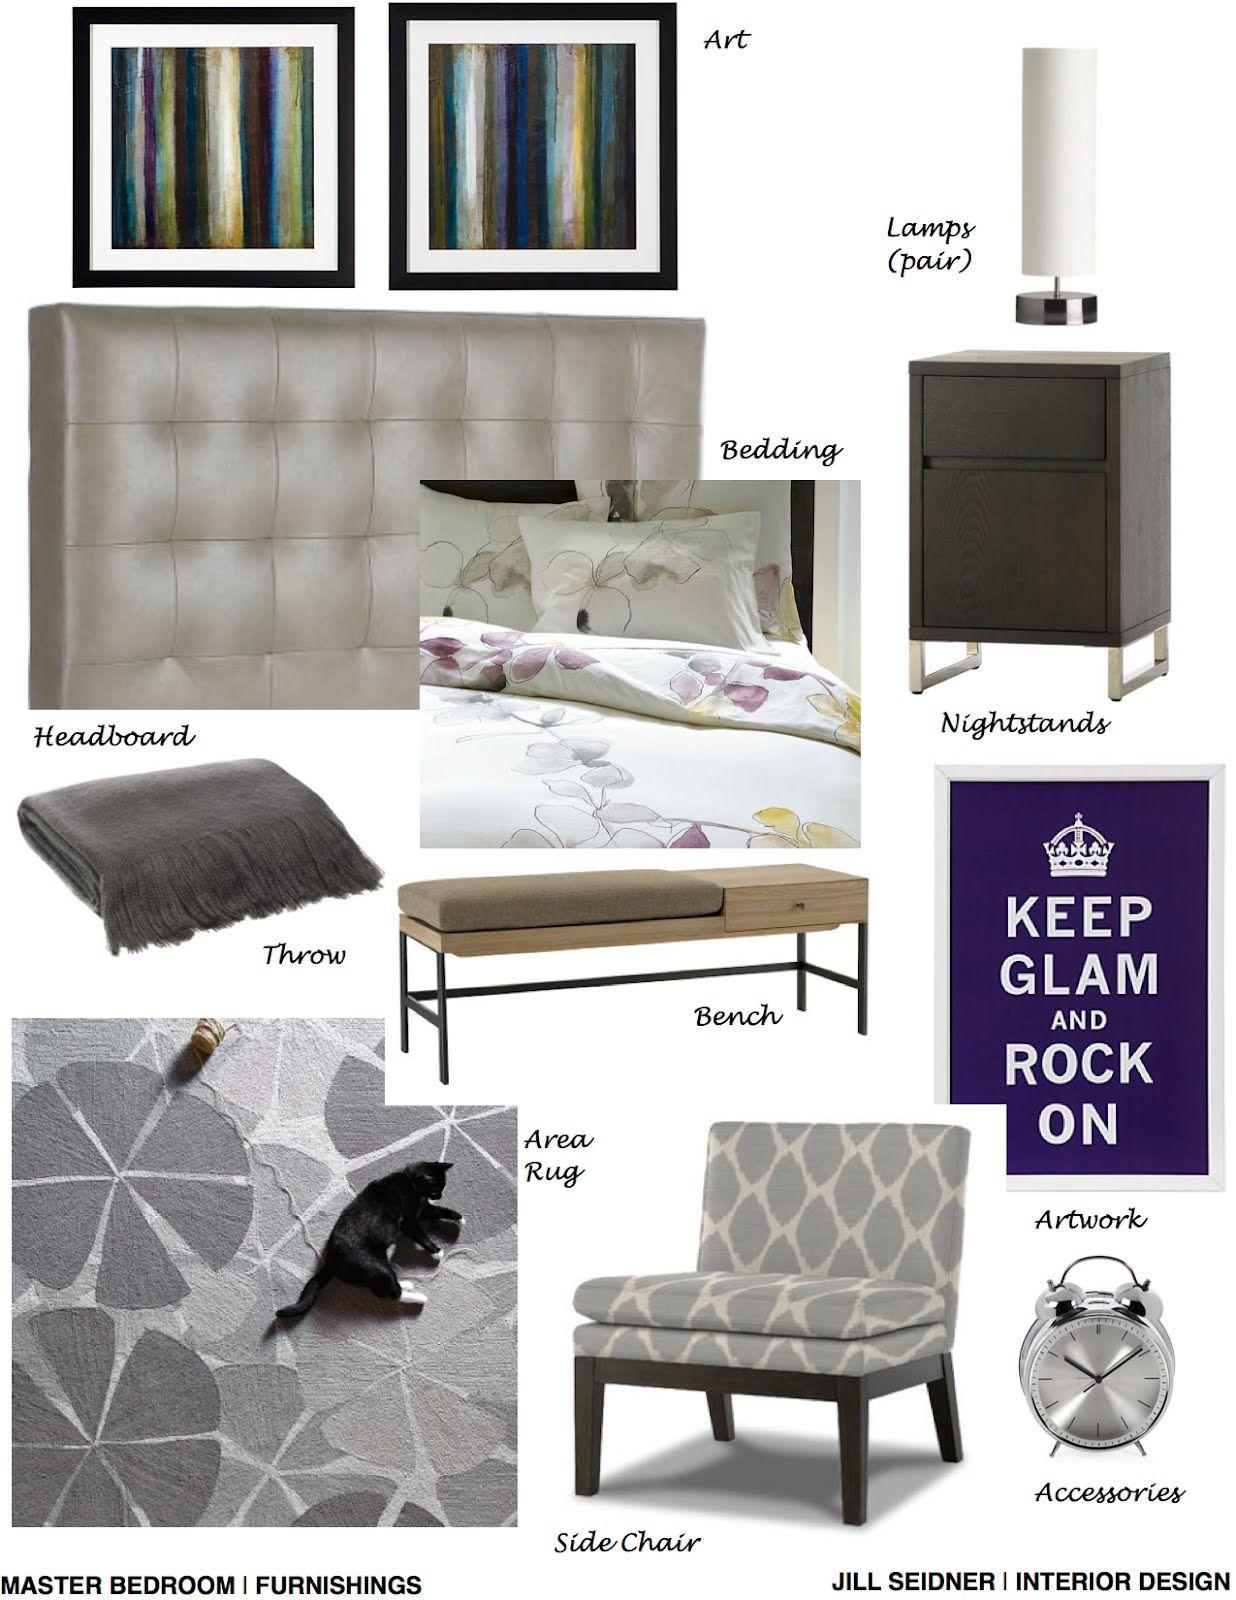 Concept Boards | Interior design, Interior design bedroom ...